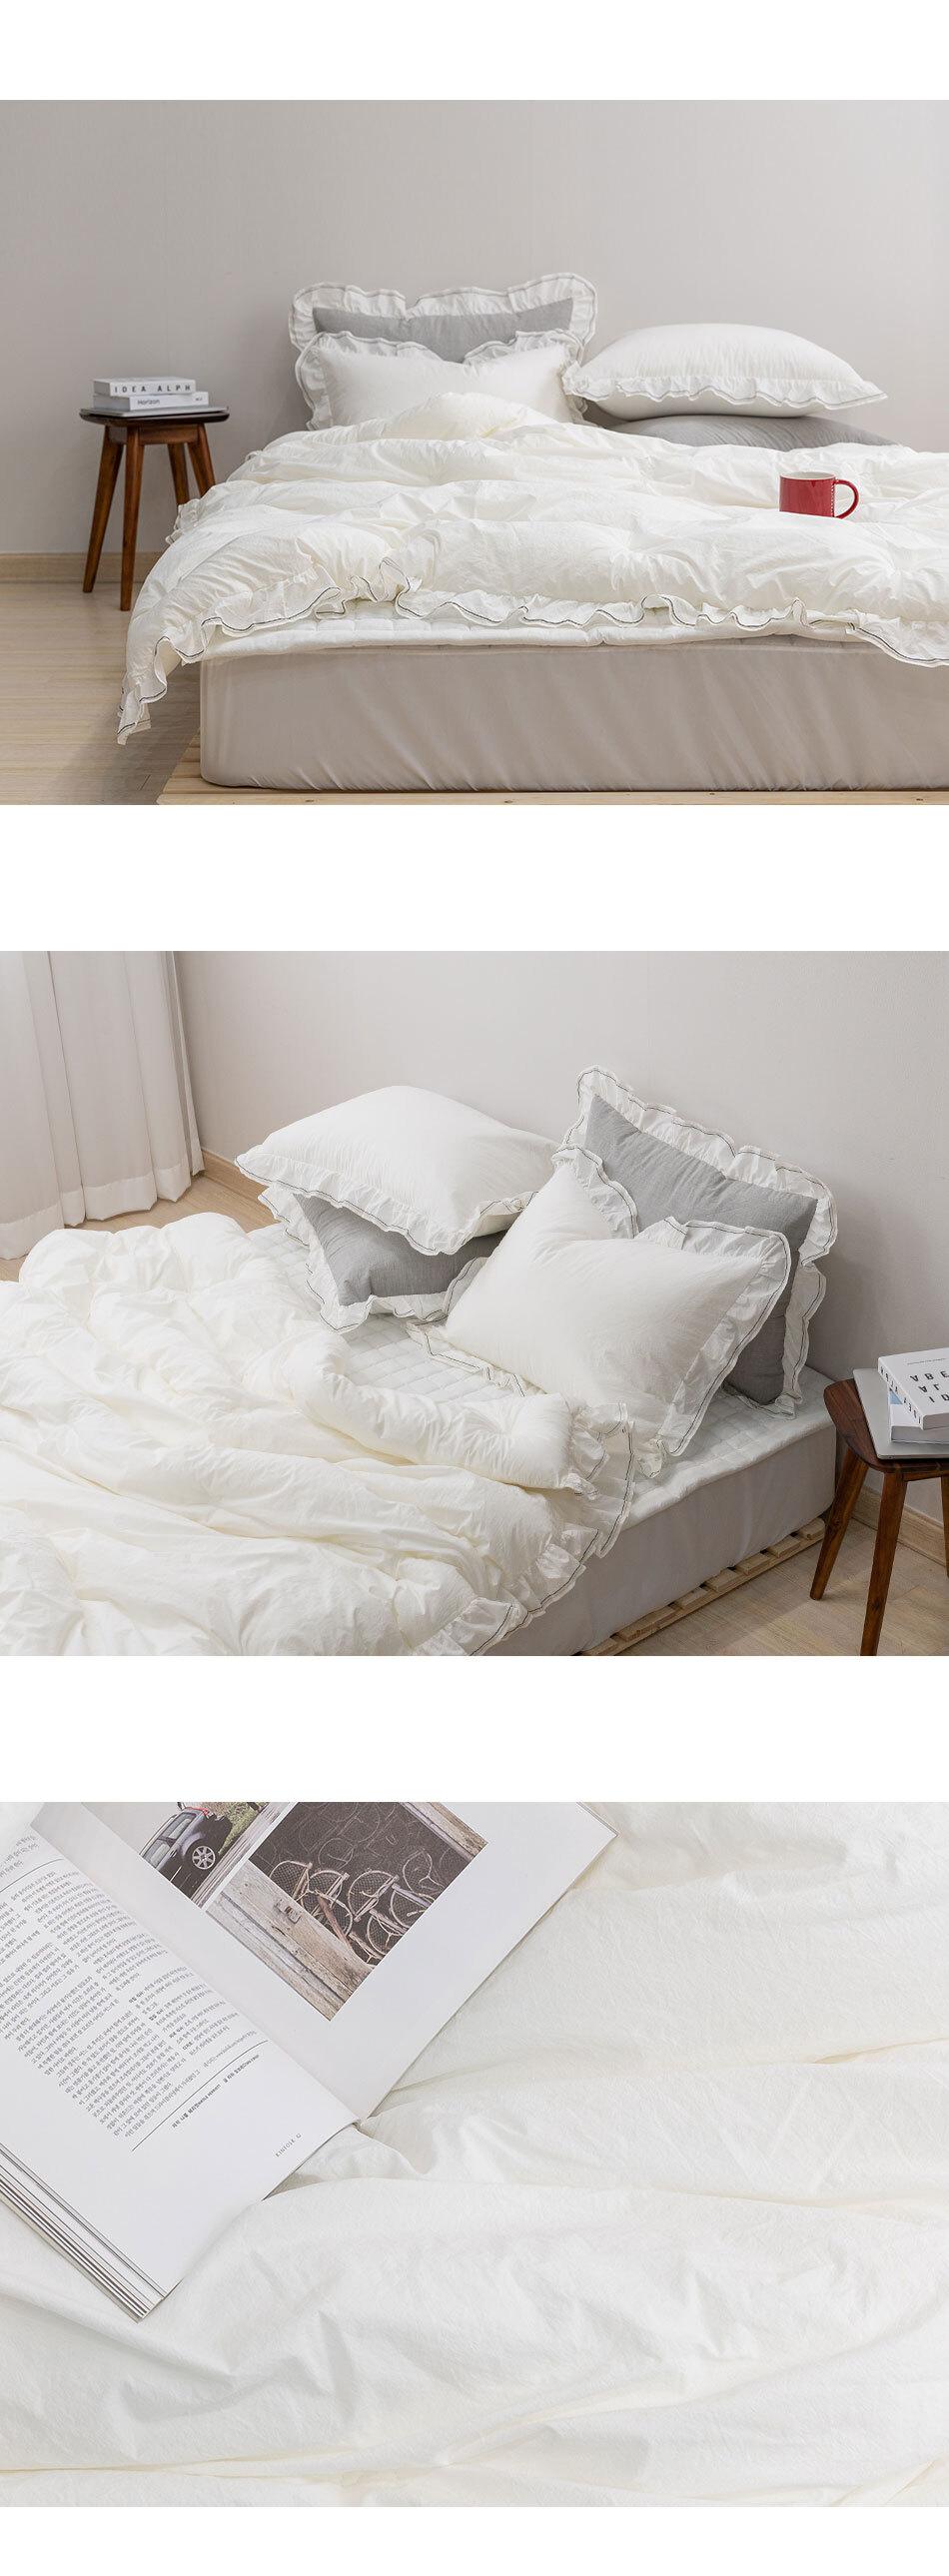 stay_bed_white1.jpg